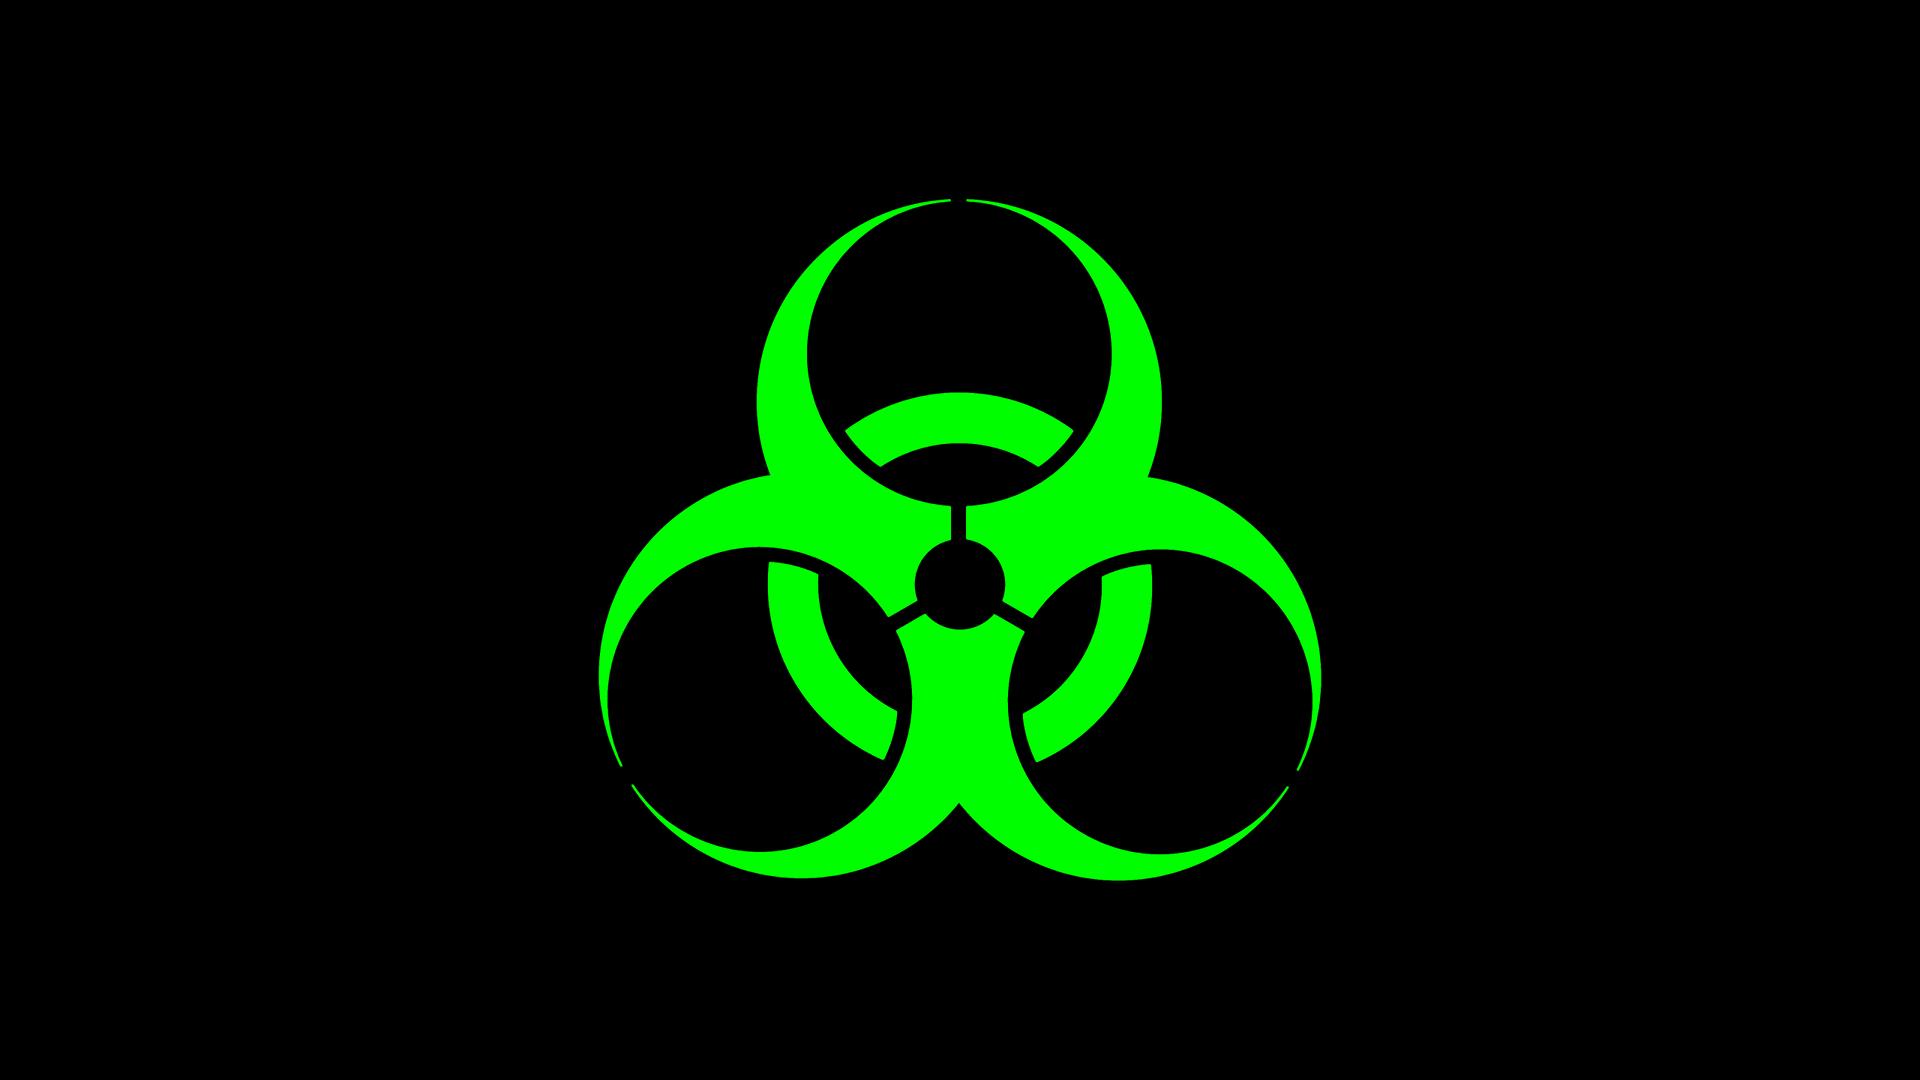 Green Biohazard Logo Wallpaper Biohazard wallpaper 1920x1080